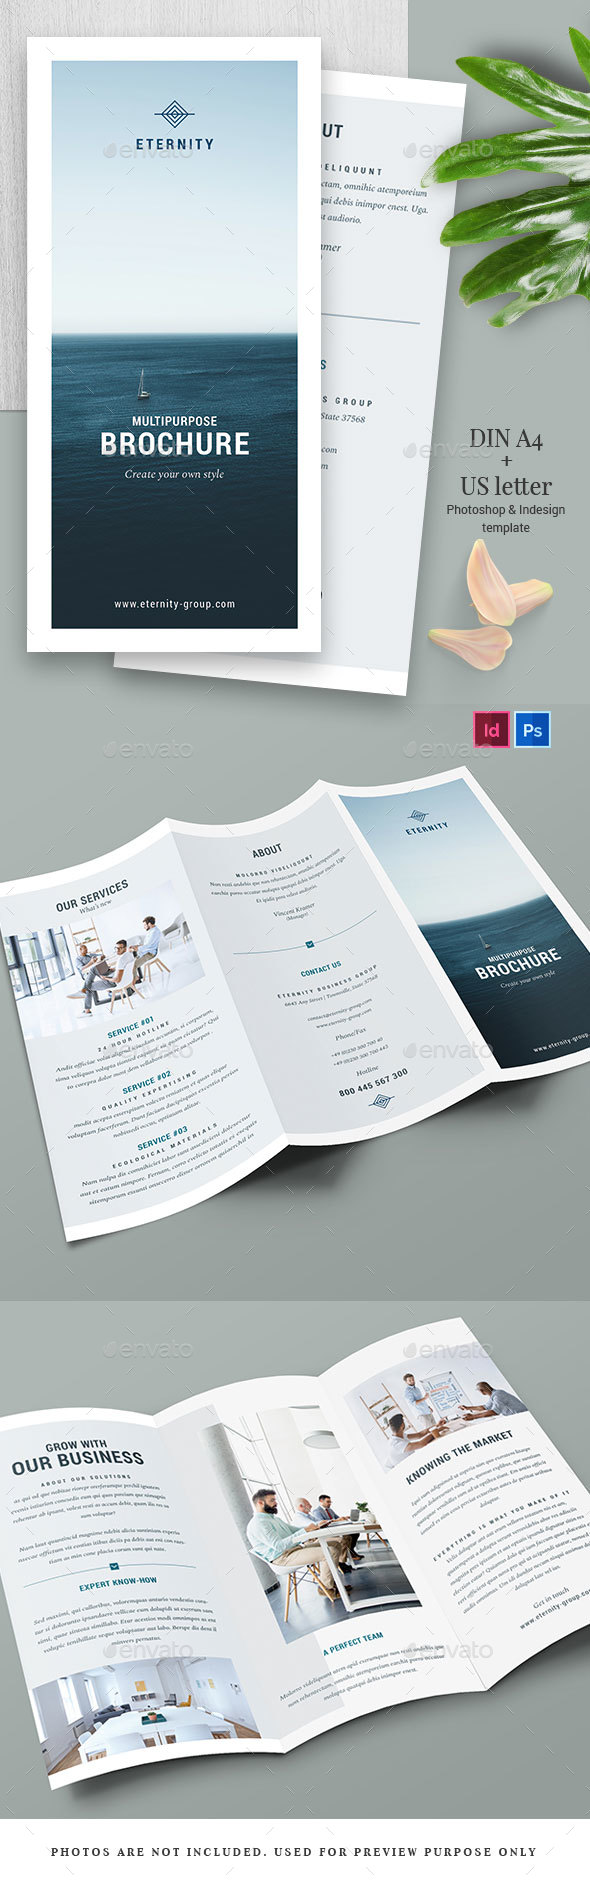 Clean Trifold Brochure - Vol.2 - Brochures Print Templates